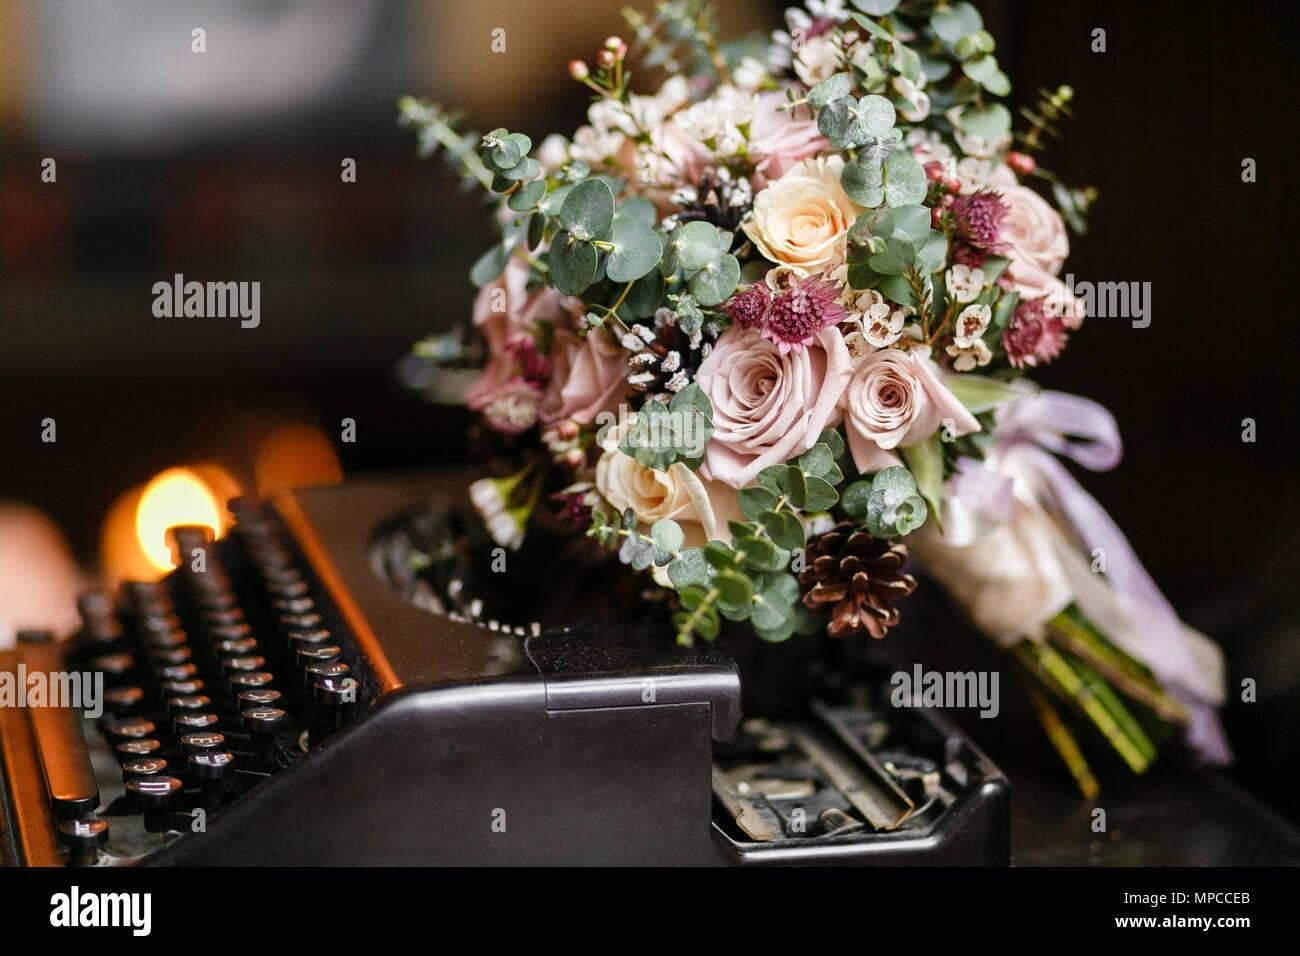 Wedding bride bouquet of fresh floral. White ranunculus flowers on typewriter,. - Stock Image